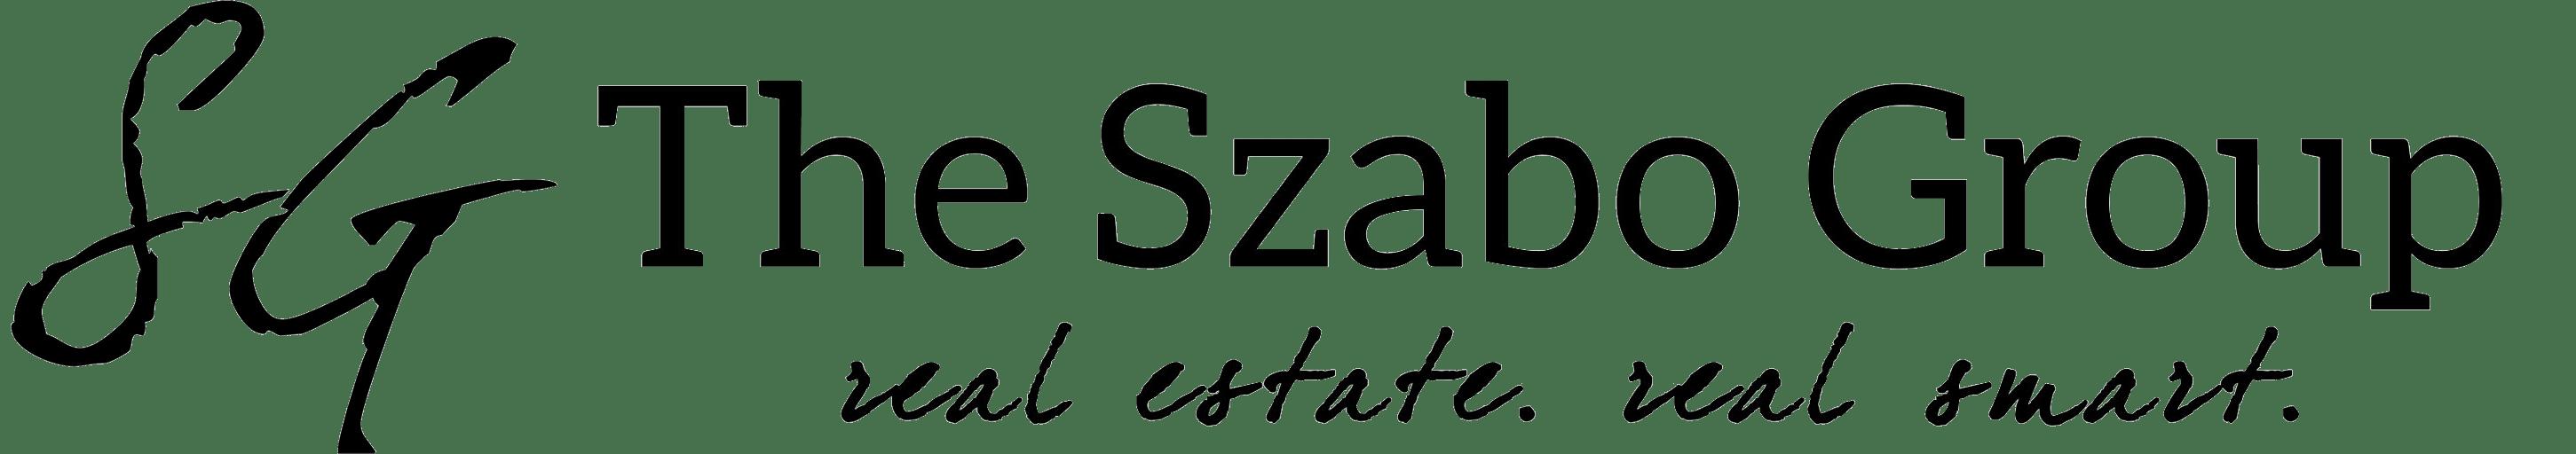 The Szabo Group